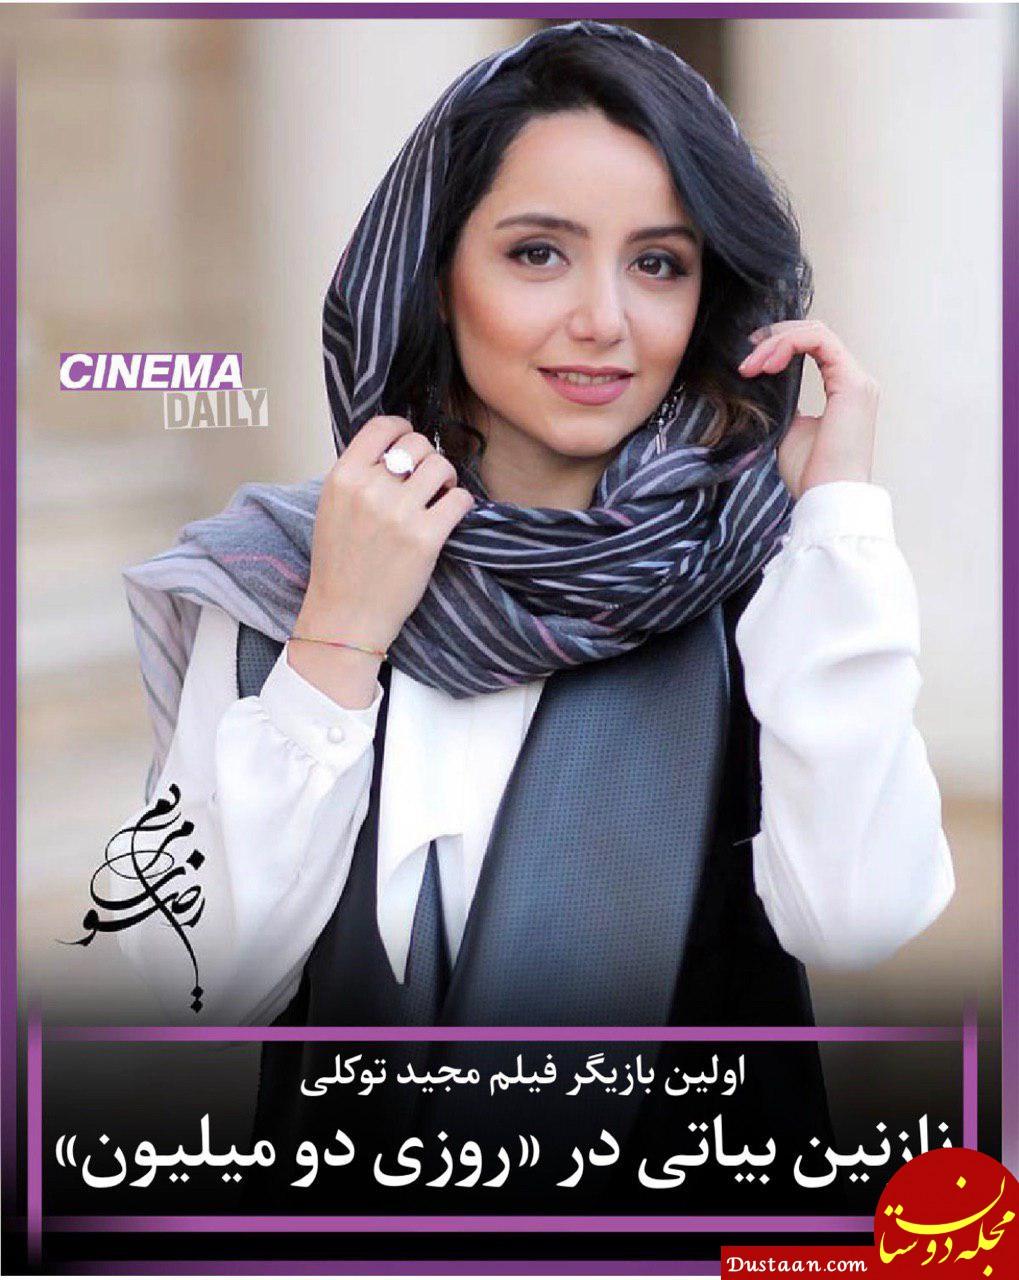 www.dustaan.com نازنین بیاتی اولین بازیگر «روزی دو میلیون»